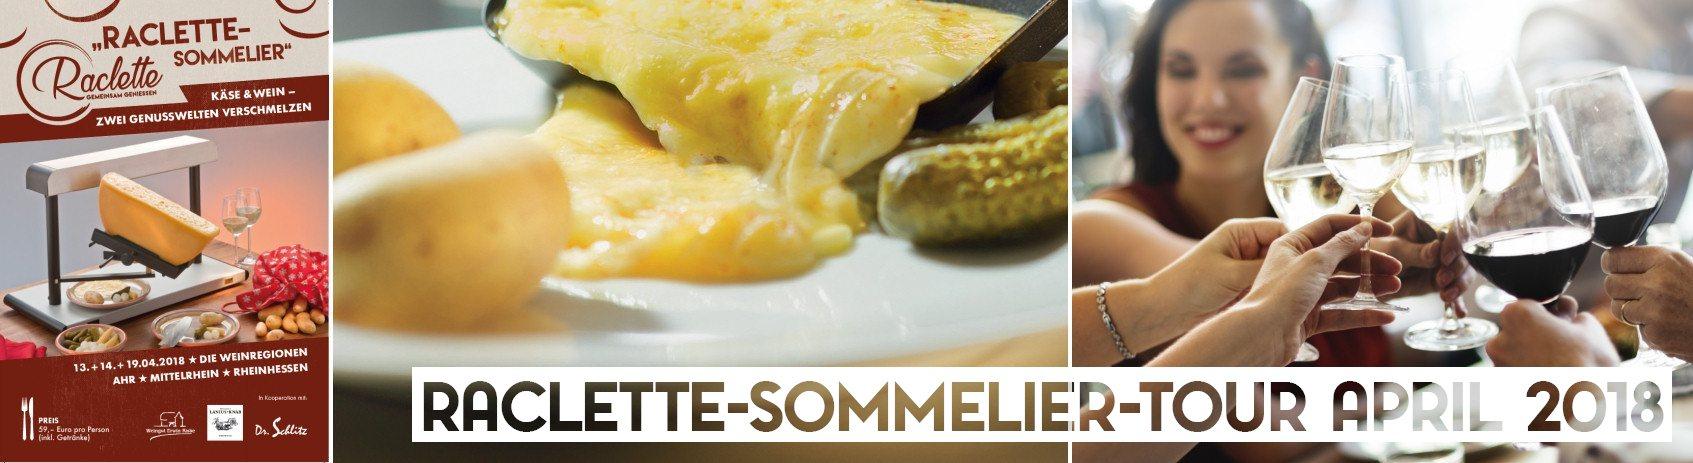 Raclette Sommelier April 2018